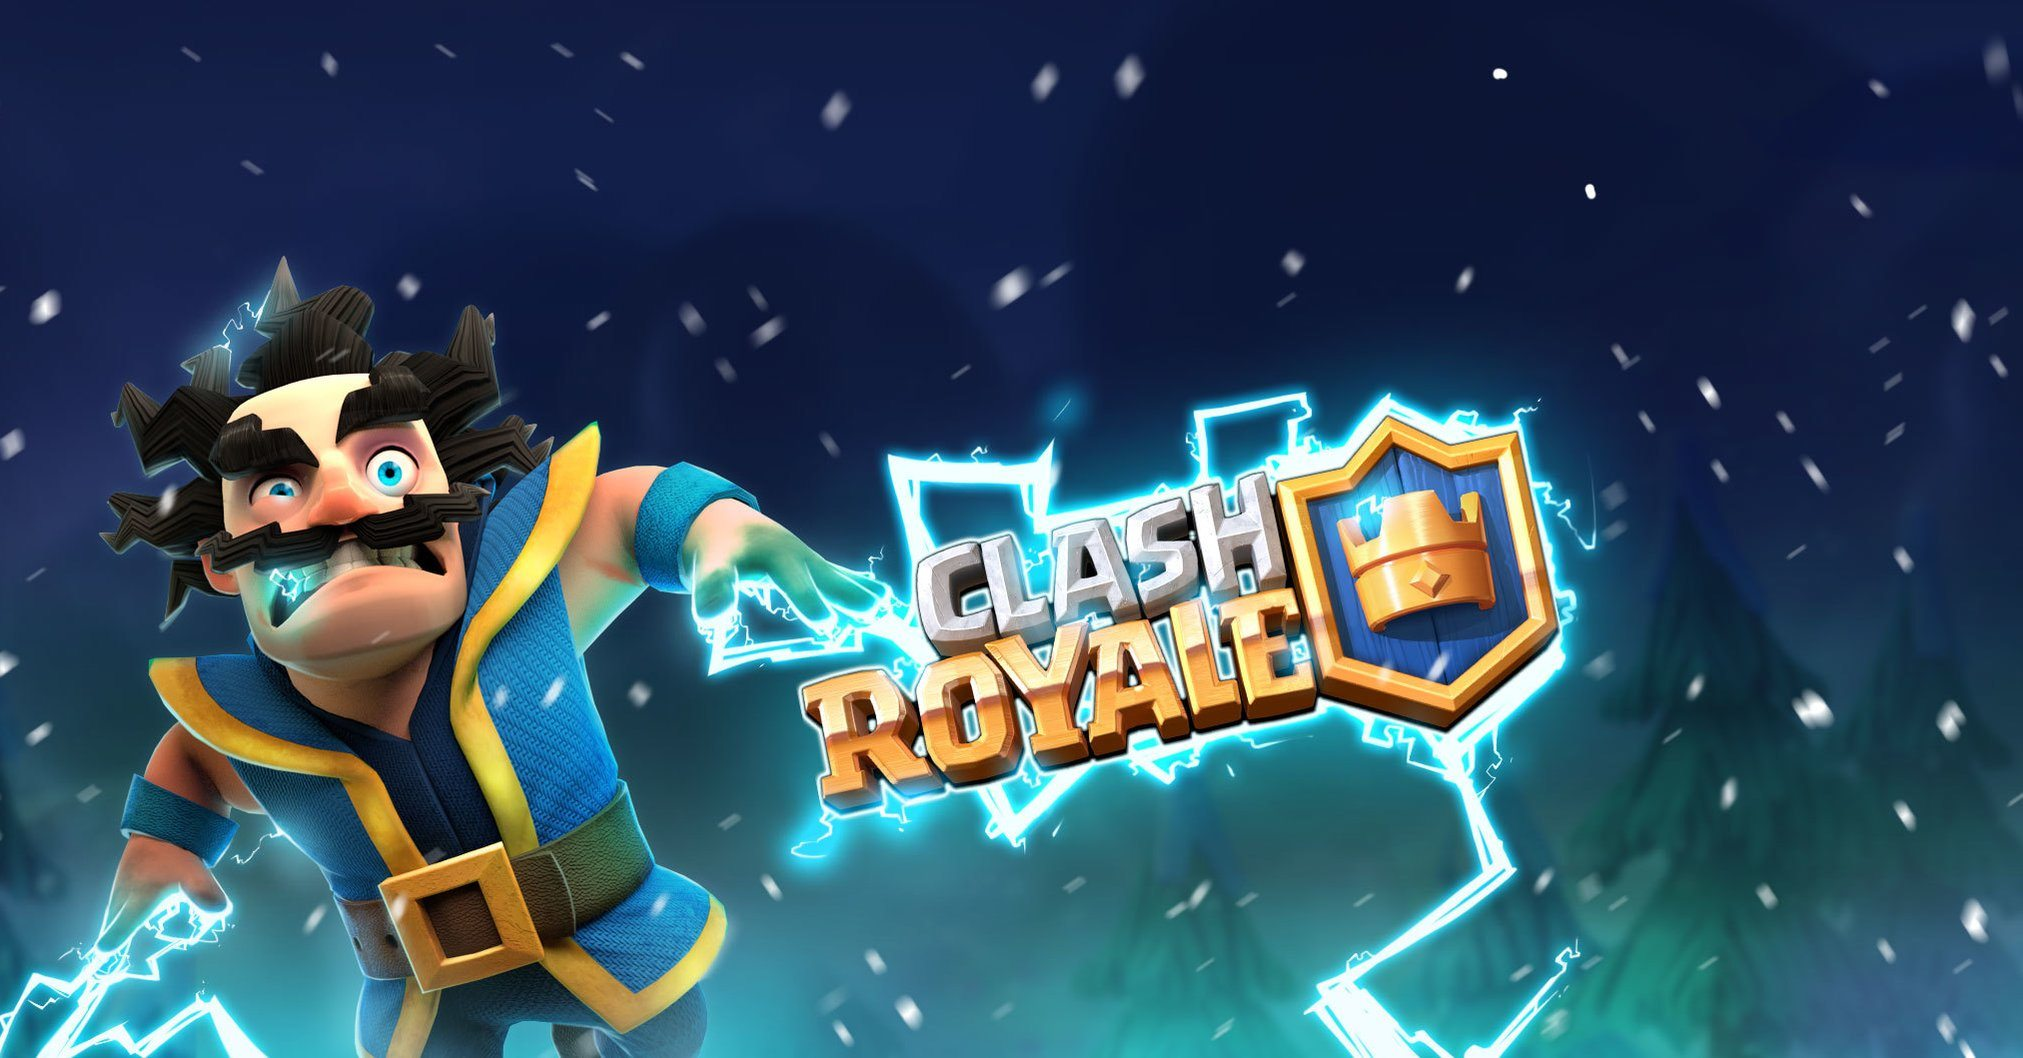 Beautiful Clash Royale Wallpaper - Clash Royale , HD Wallpaper & Backgrounds